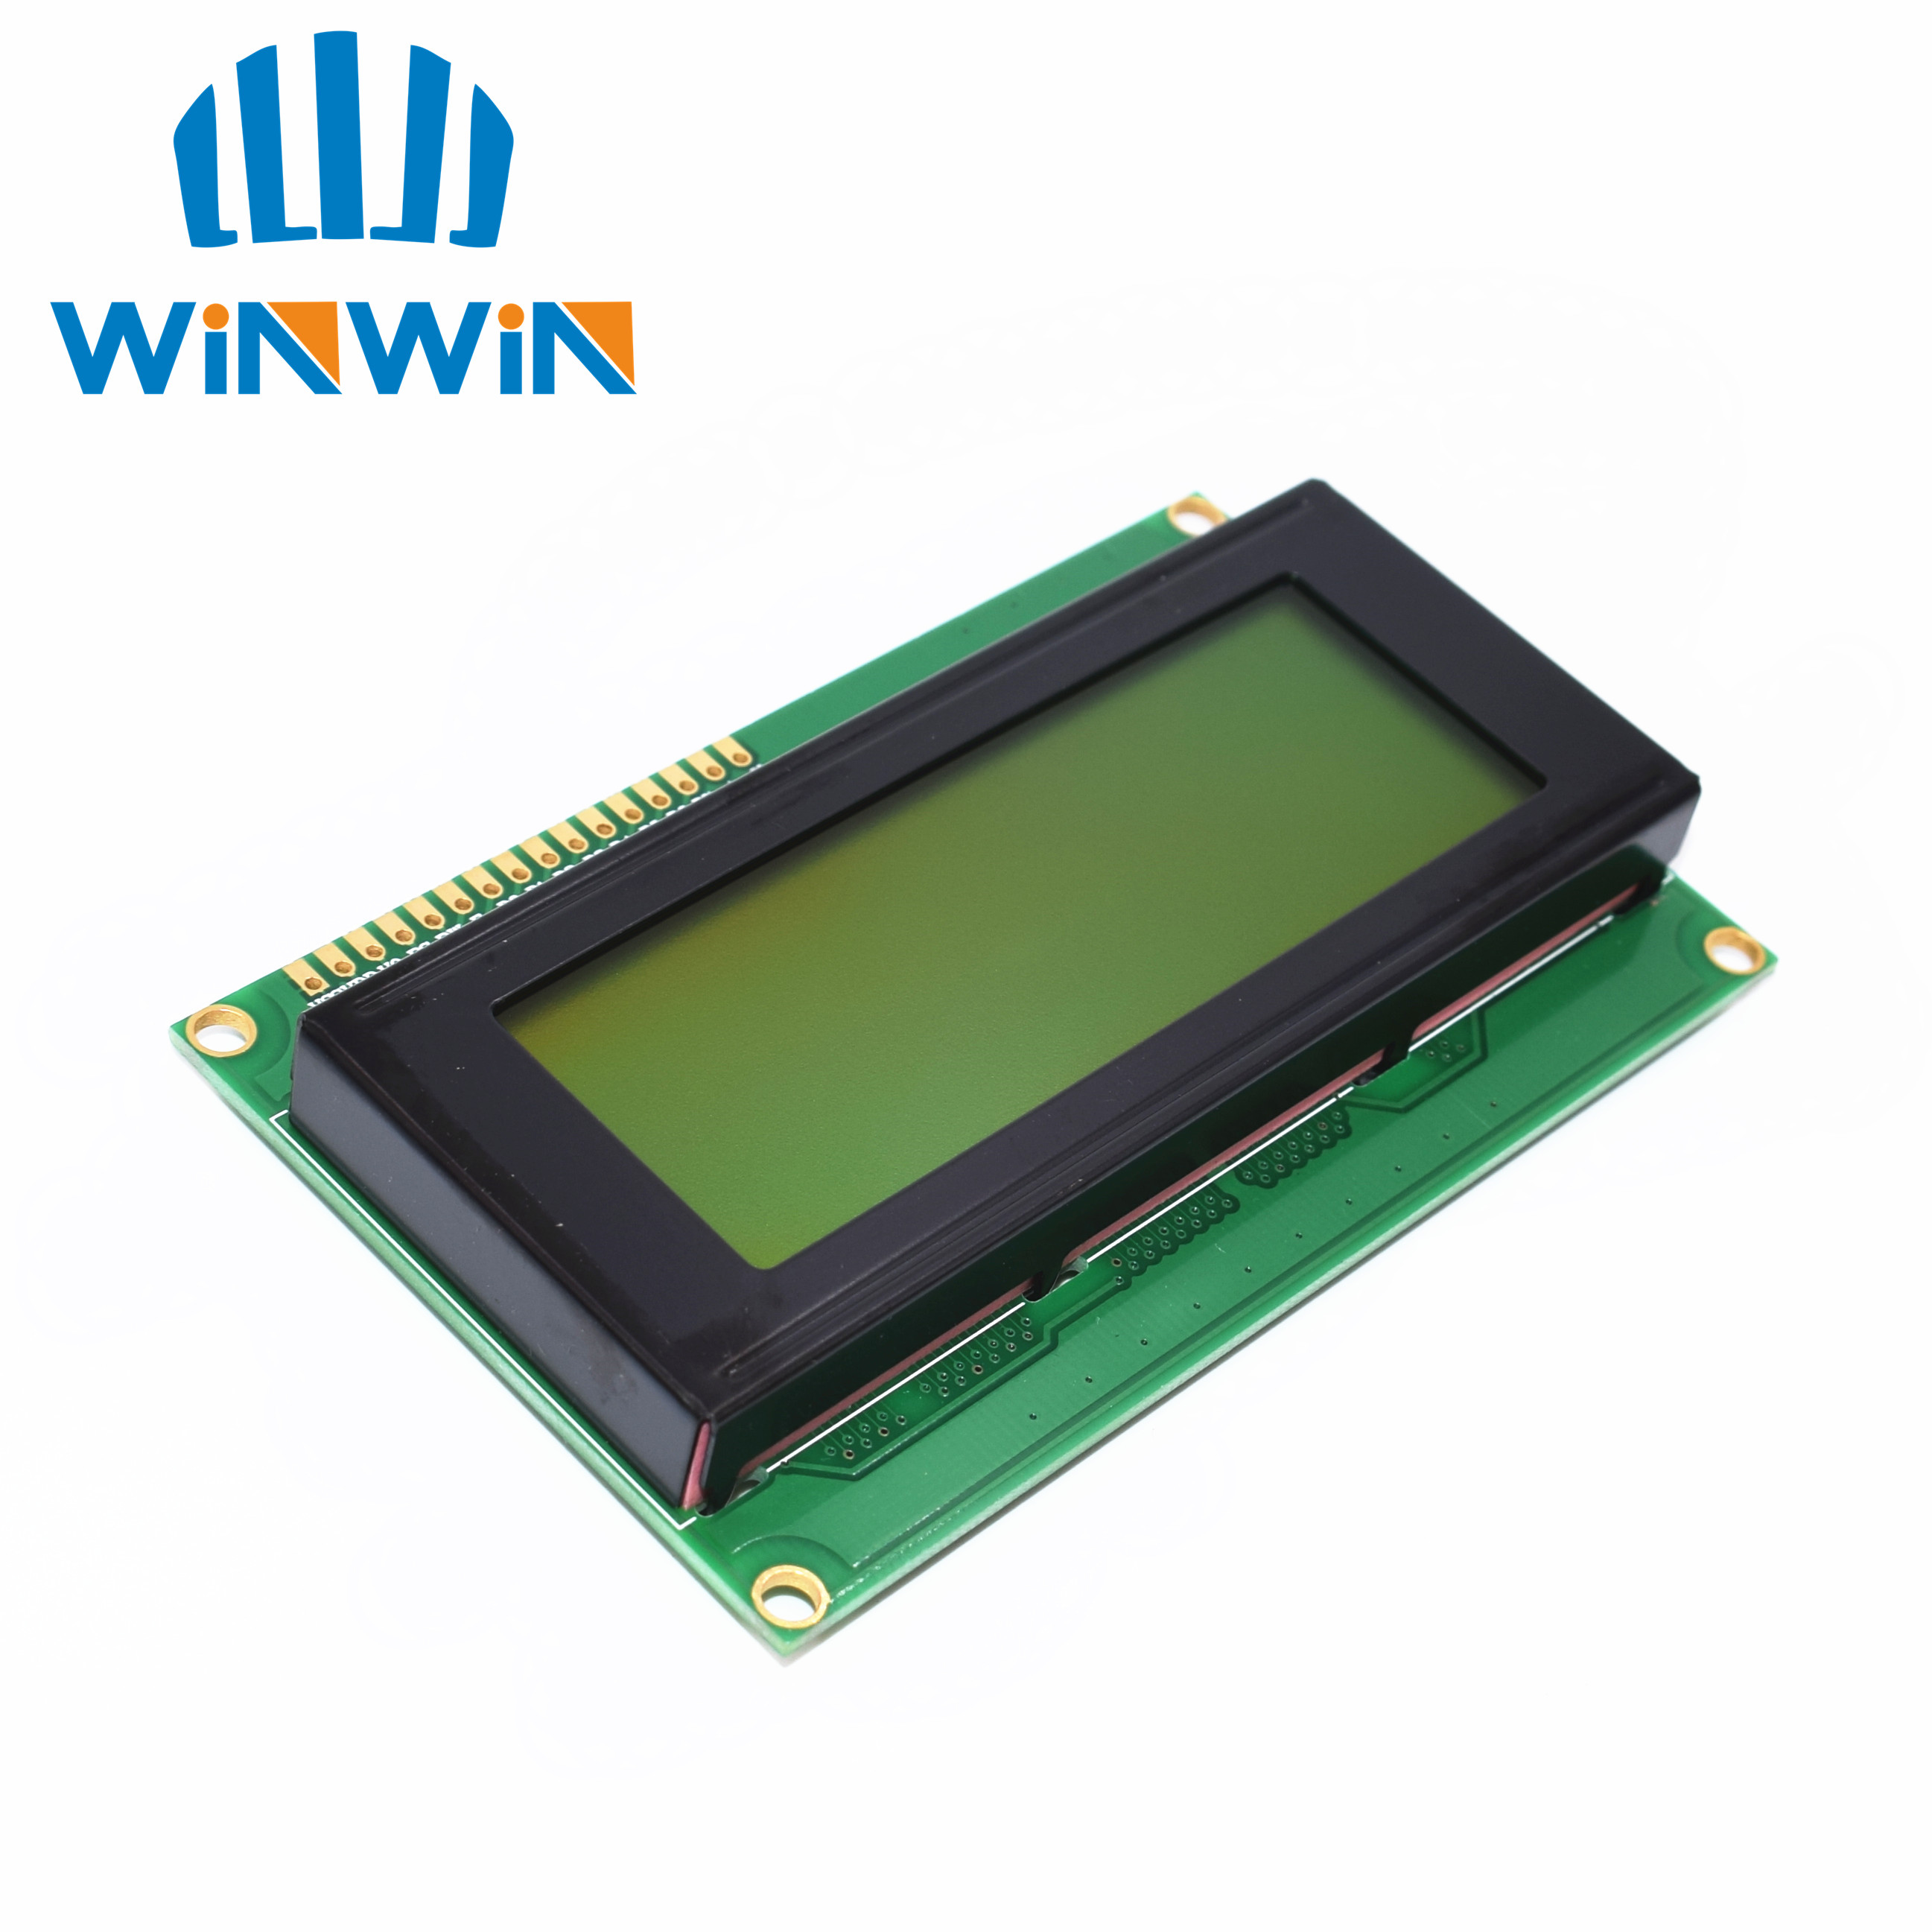 1pcs LCD Board 2004 20*4 LCD 20X4 5V Yellow-green Screen LCD2004 Display LCD Module LCD 2004